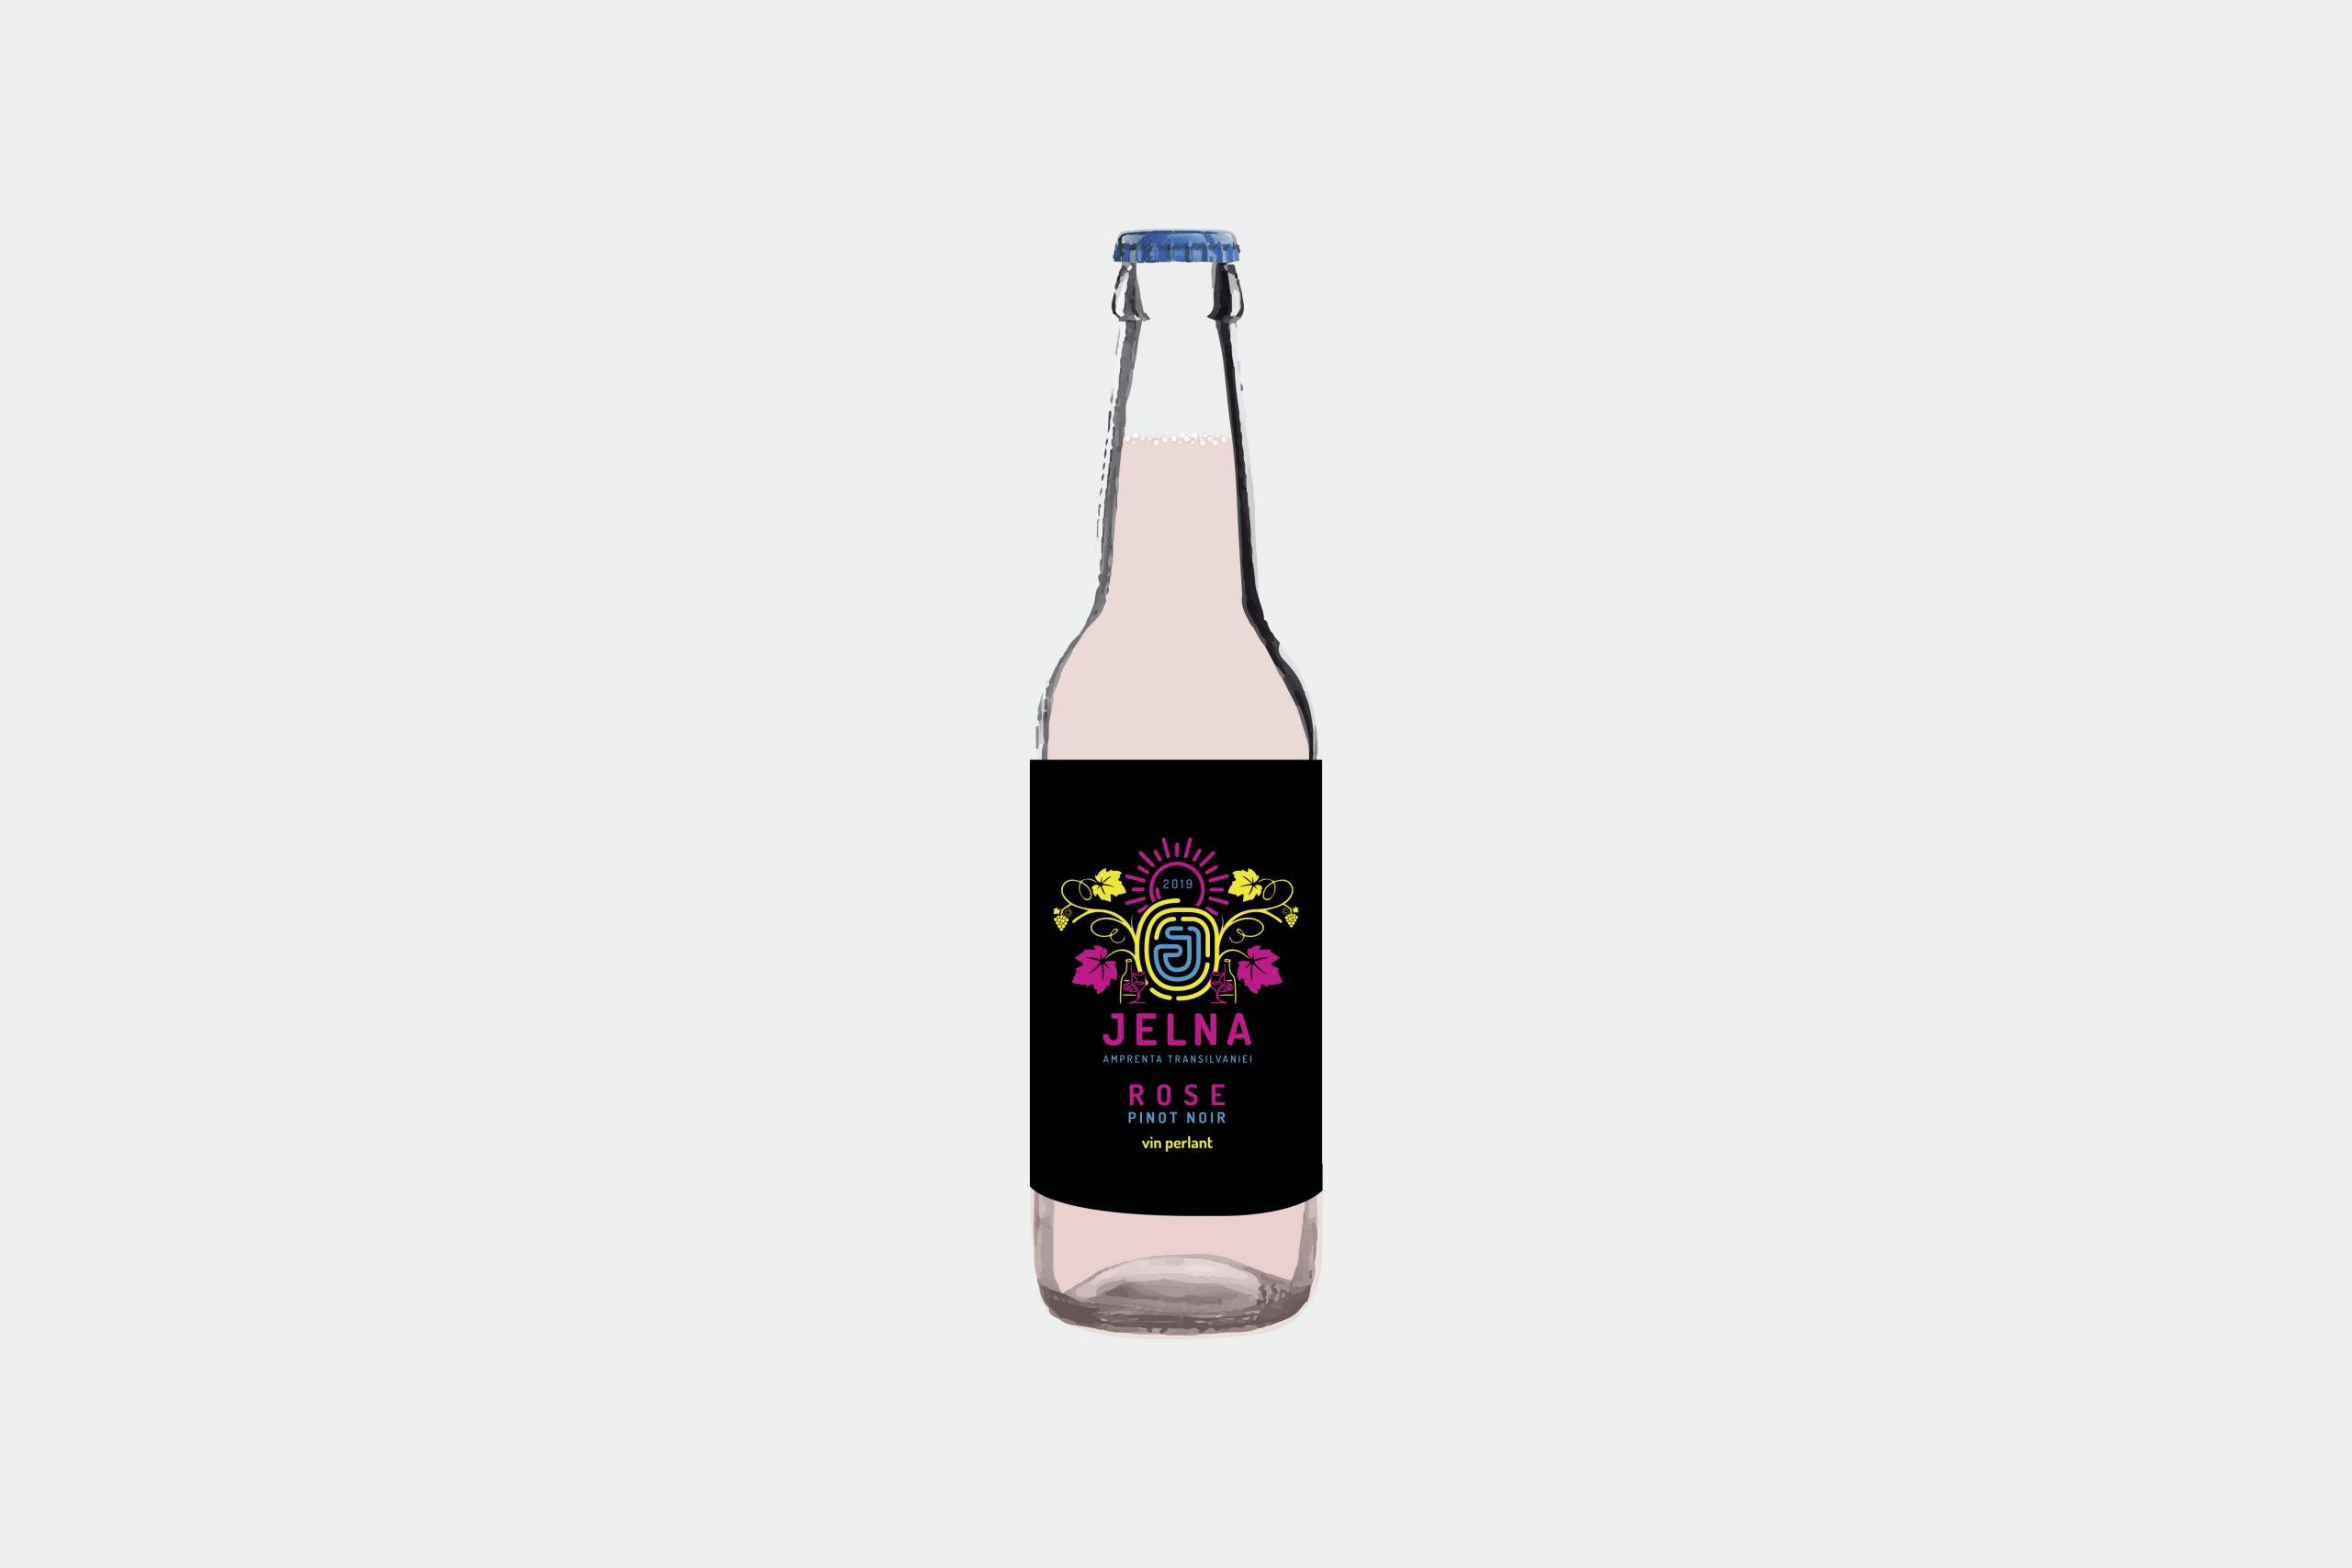 Perlant Rose Pinot Noir